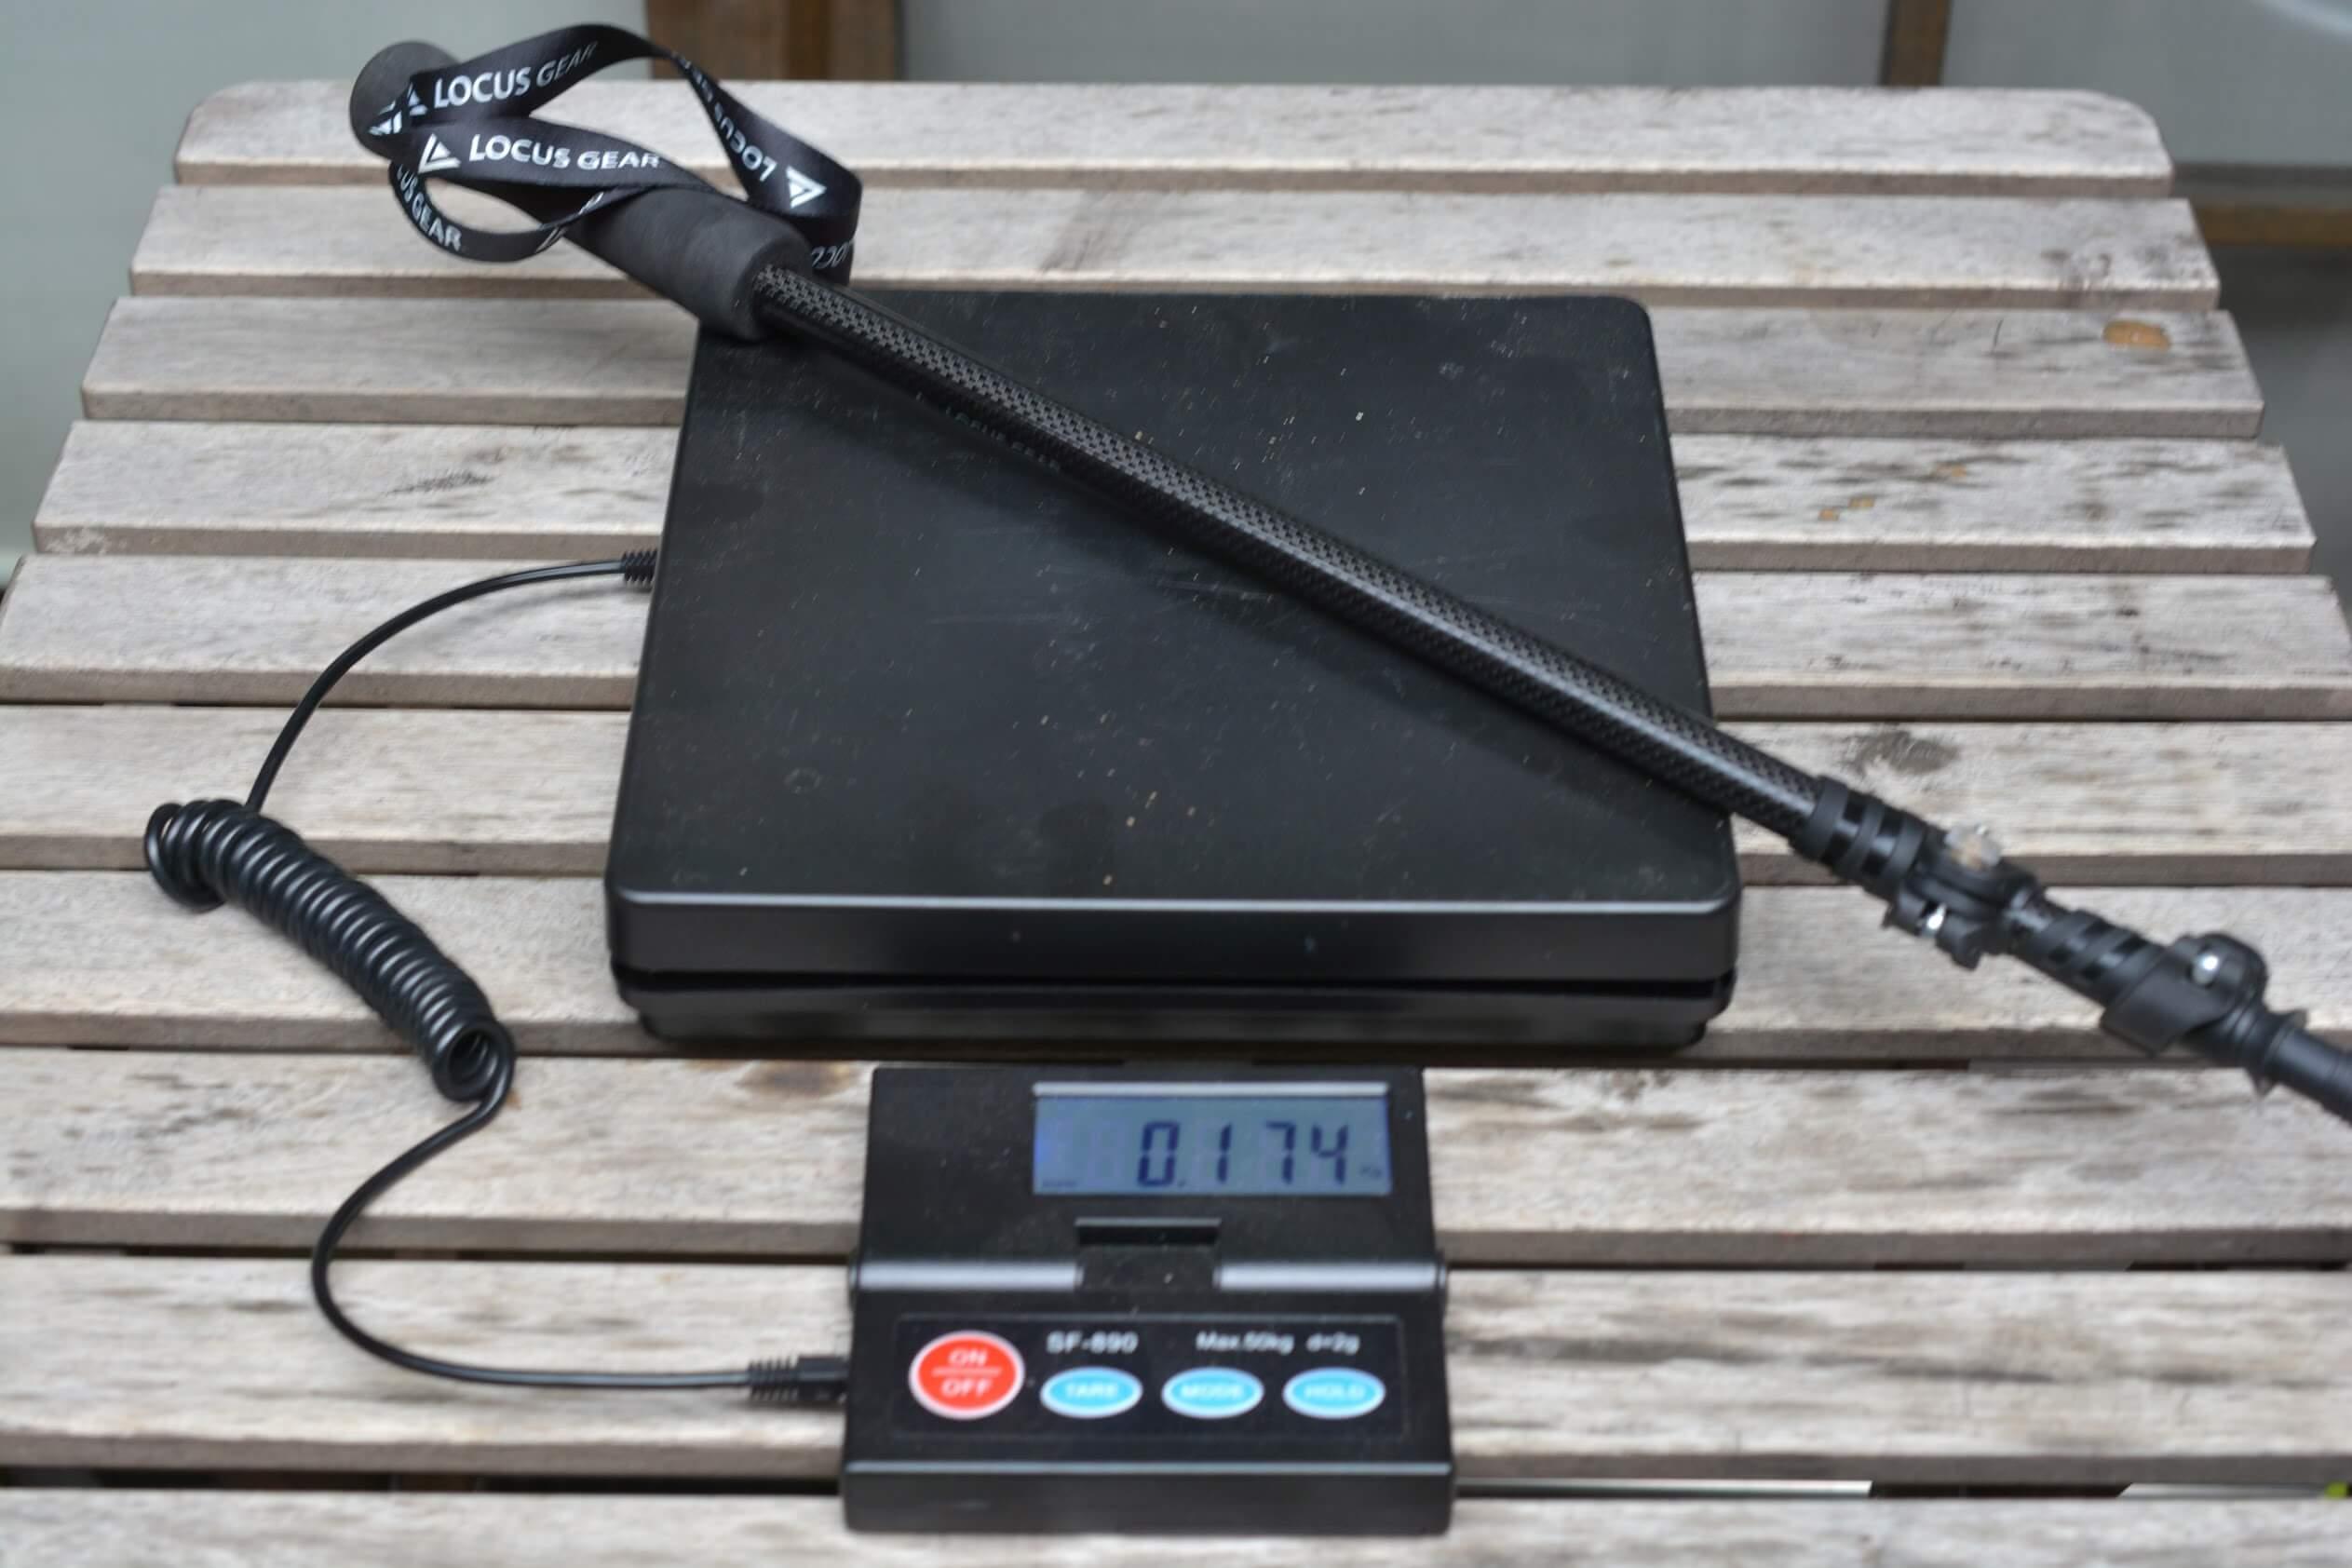 LocusGear Khufu HB / ローカスギア クフ HB トレッキングポール 重量